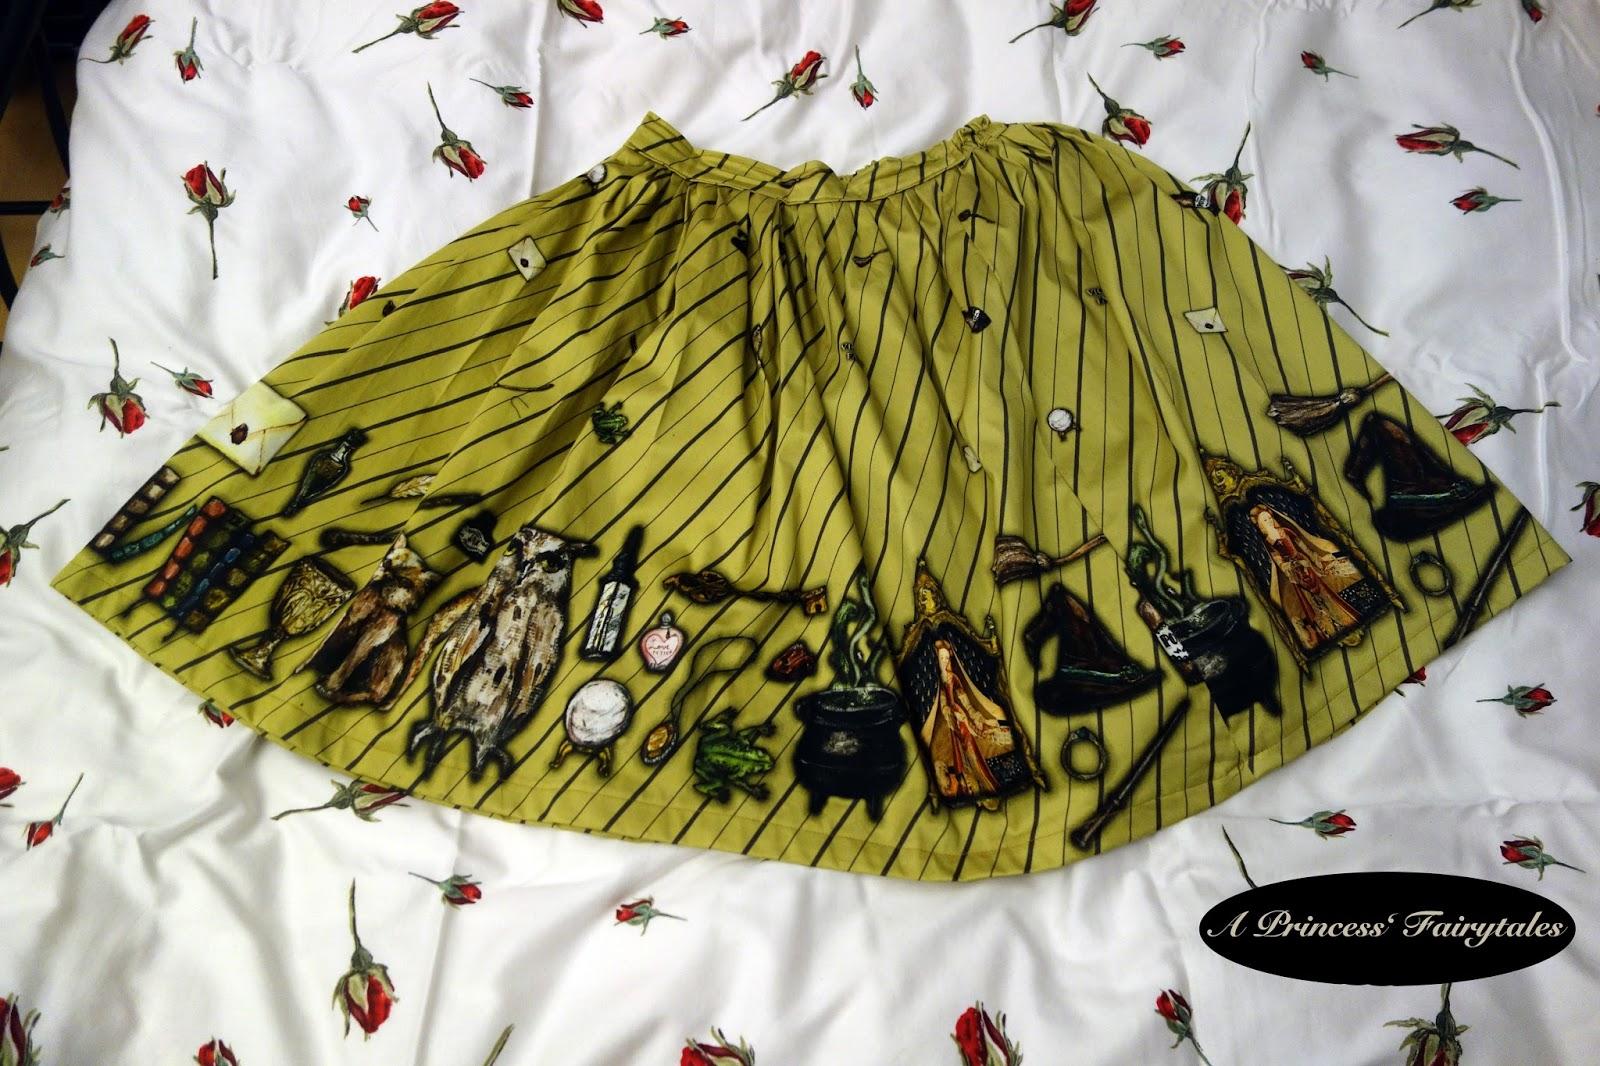 A Princess' Fairytales: 『Lolita Wardrobe』Main Pieces and a bit more